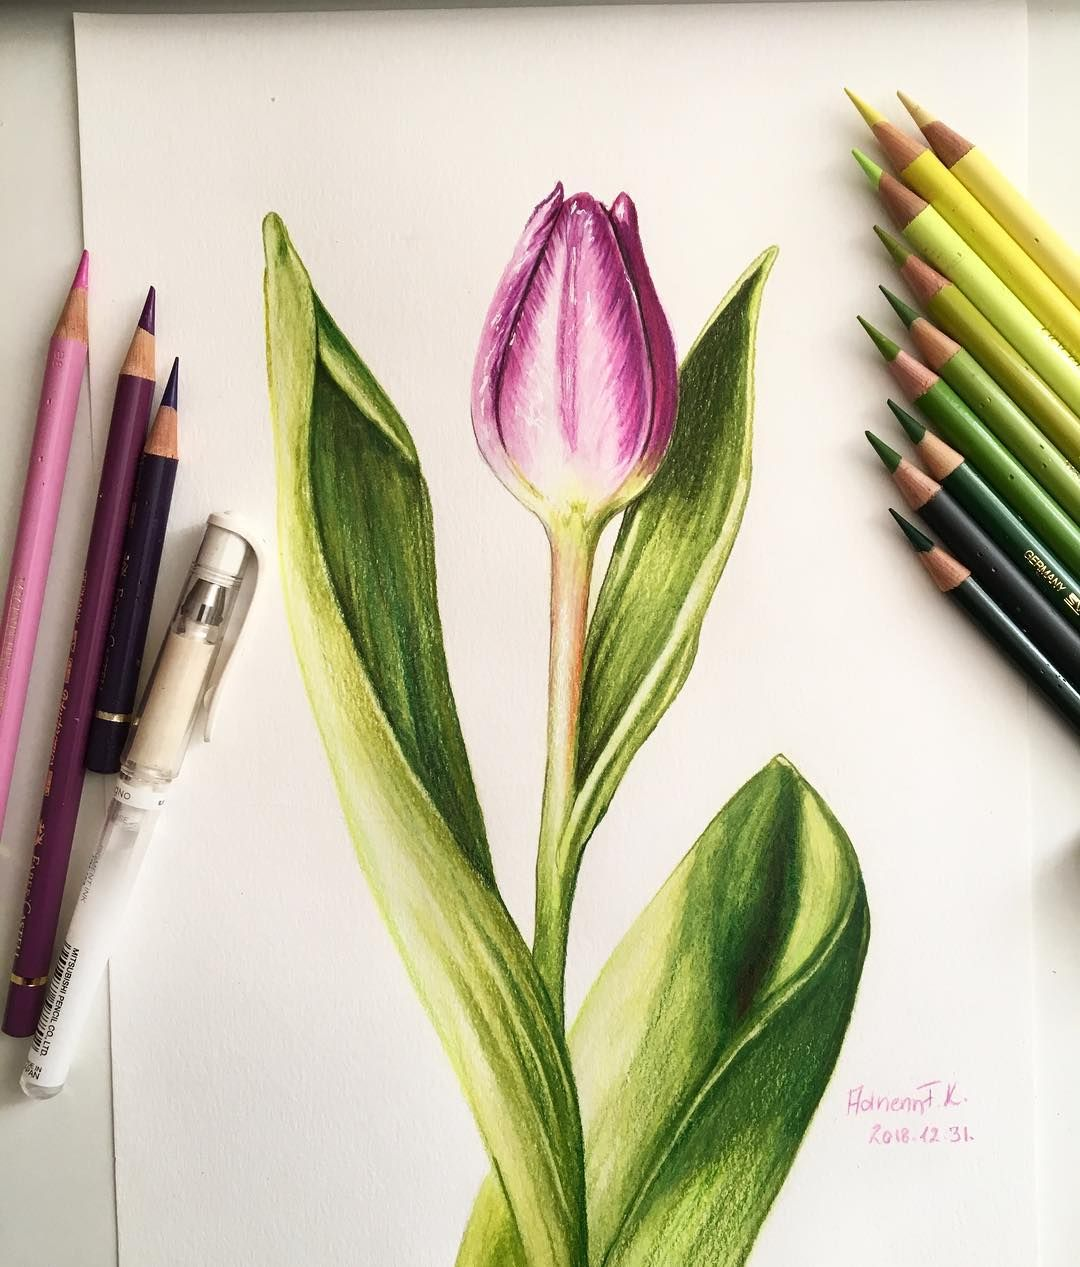 Adrienn F K On Instagram Day 6 6 Nap Tulip A4 Colored